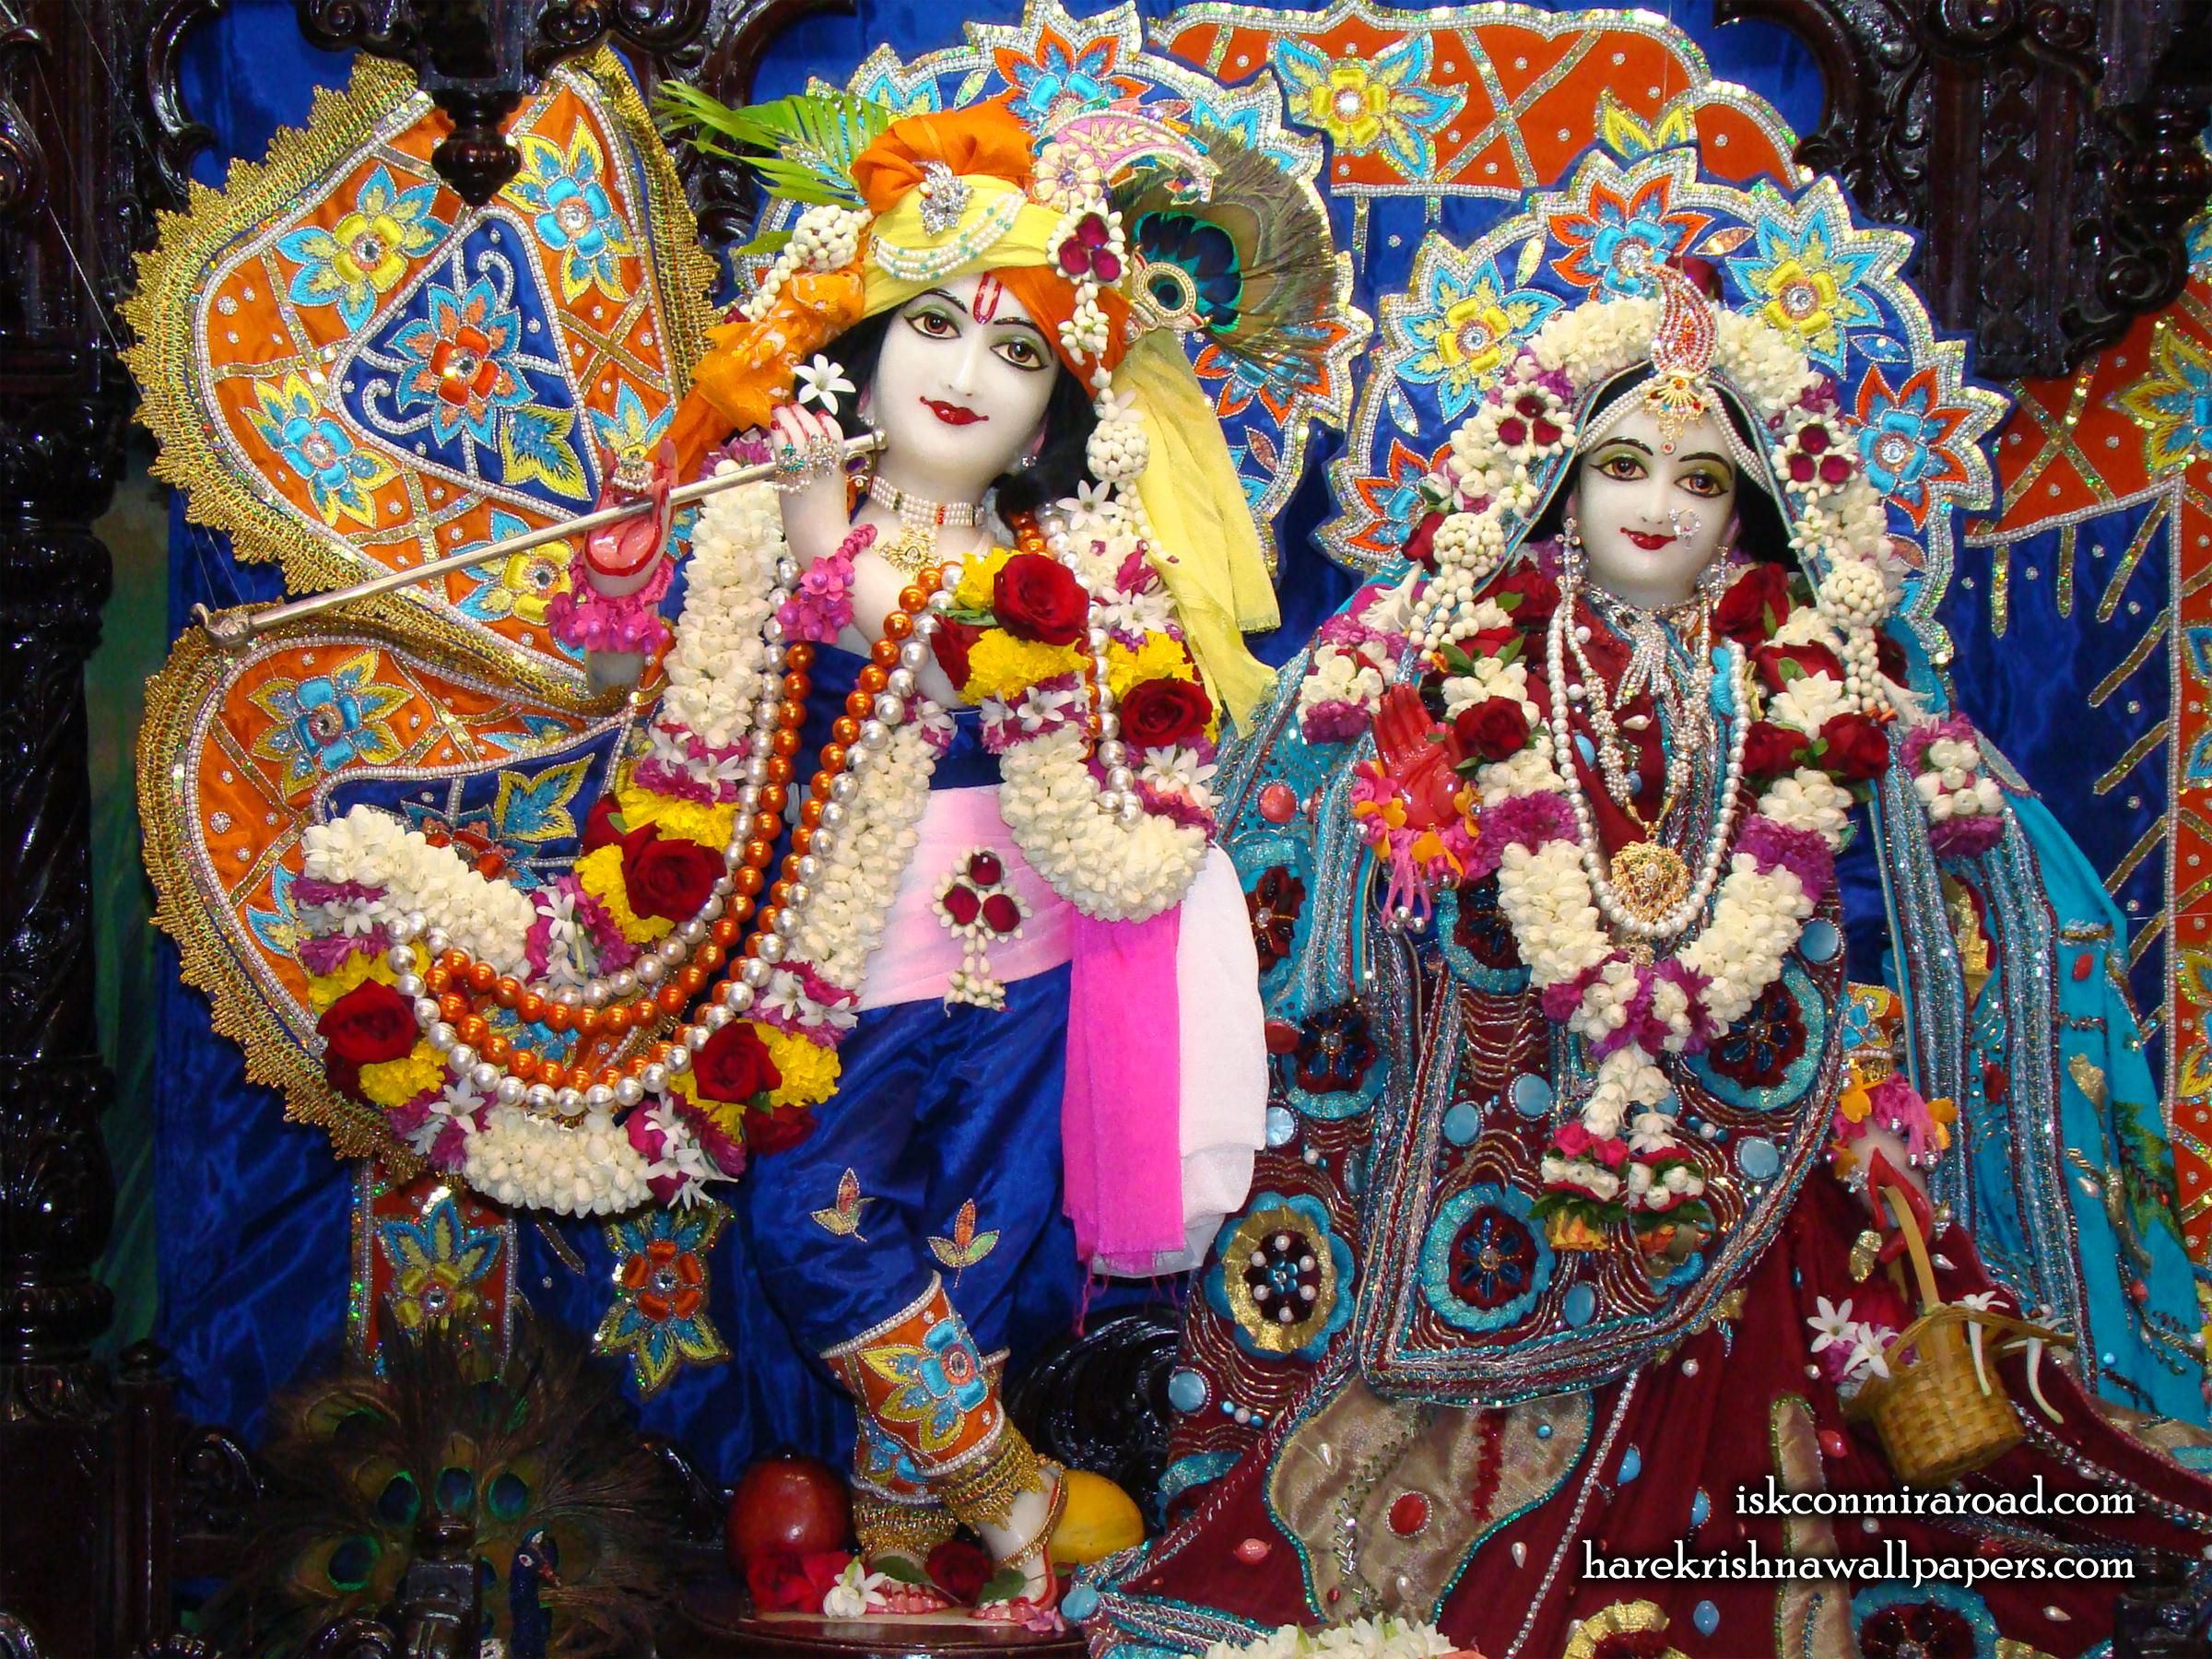 Sri Sri Radha Giridhari Wallpaper (018) Size 2400x1800 Download